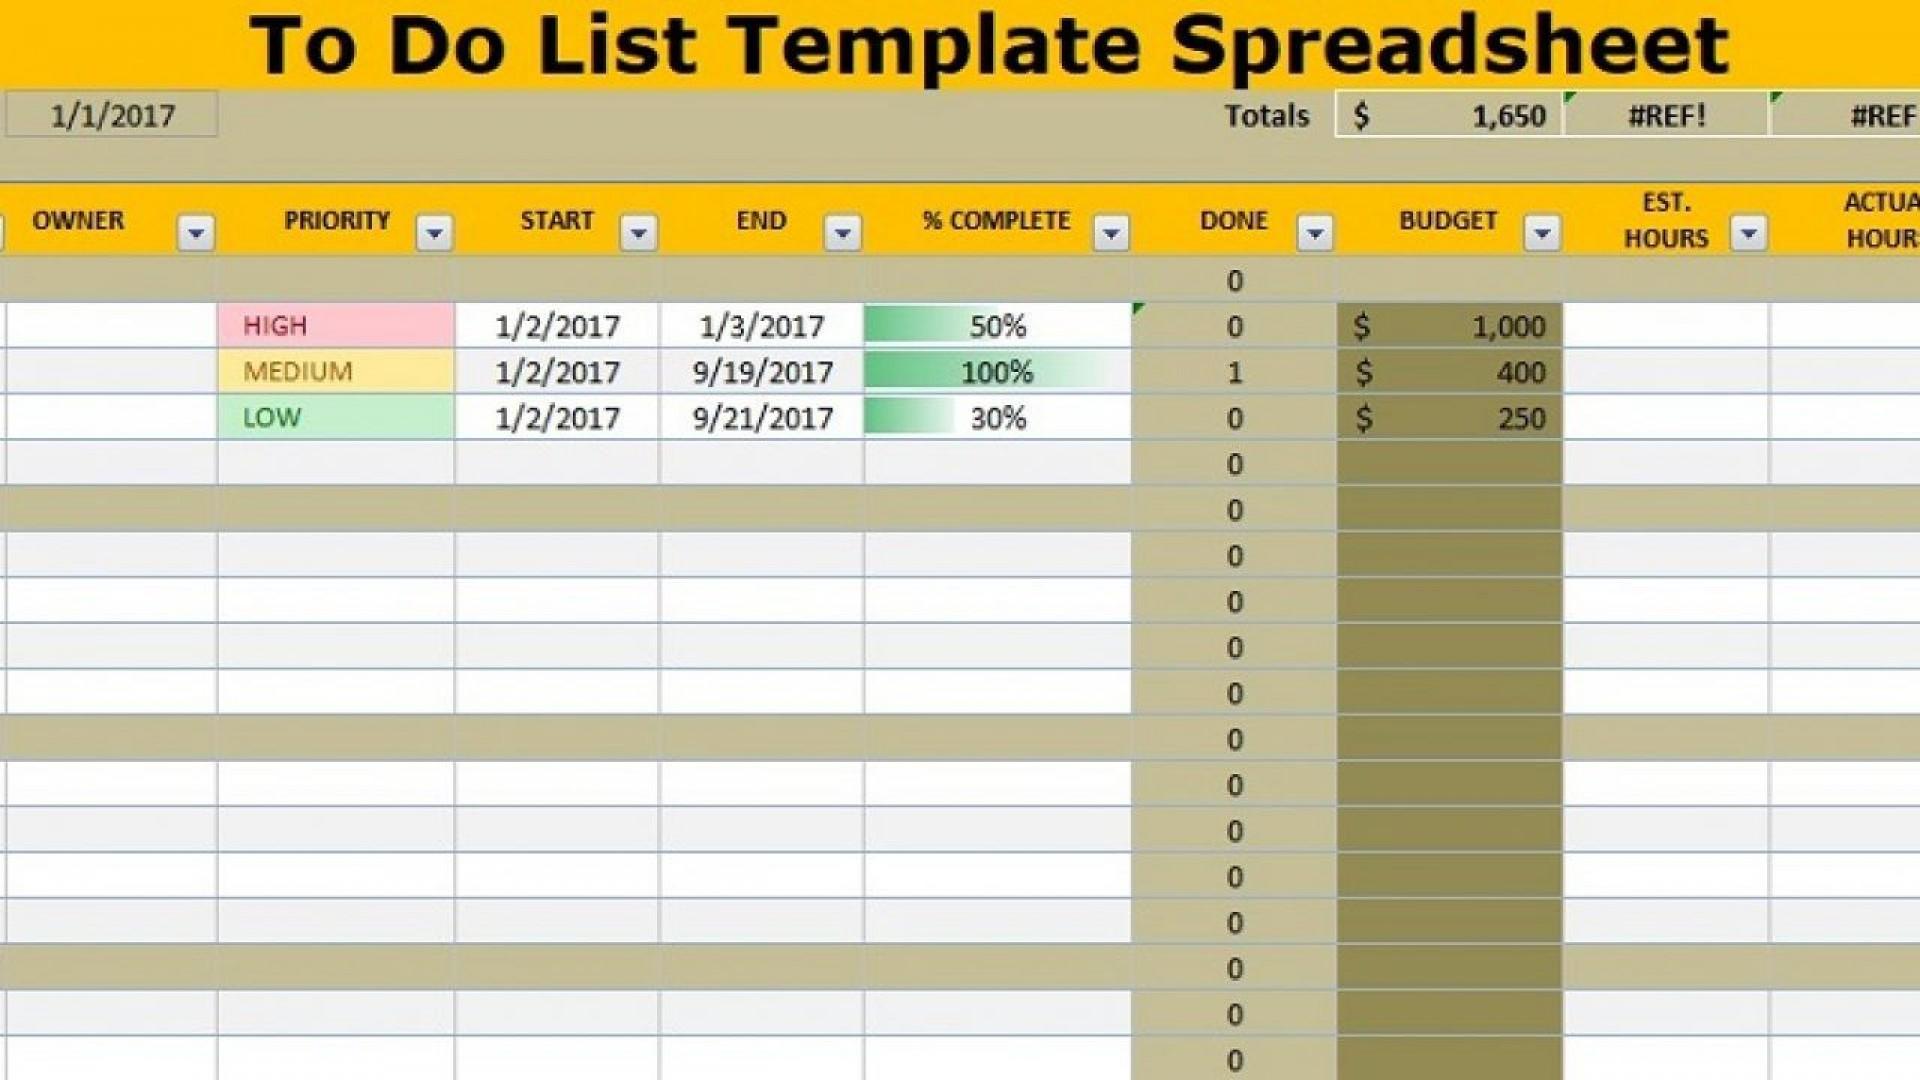 009 Sensational Excel To Do List Template Image  Xlsx Best1920